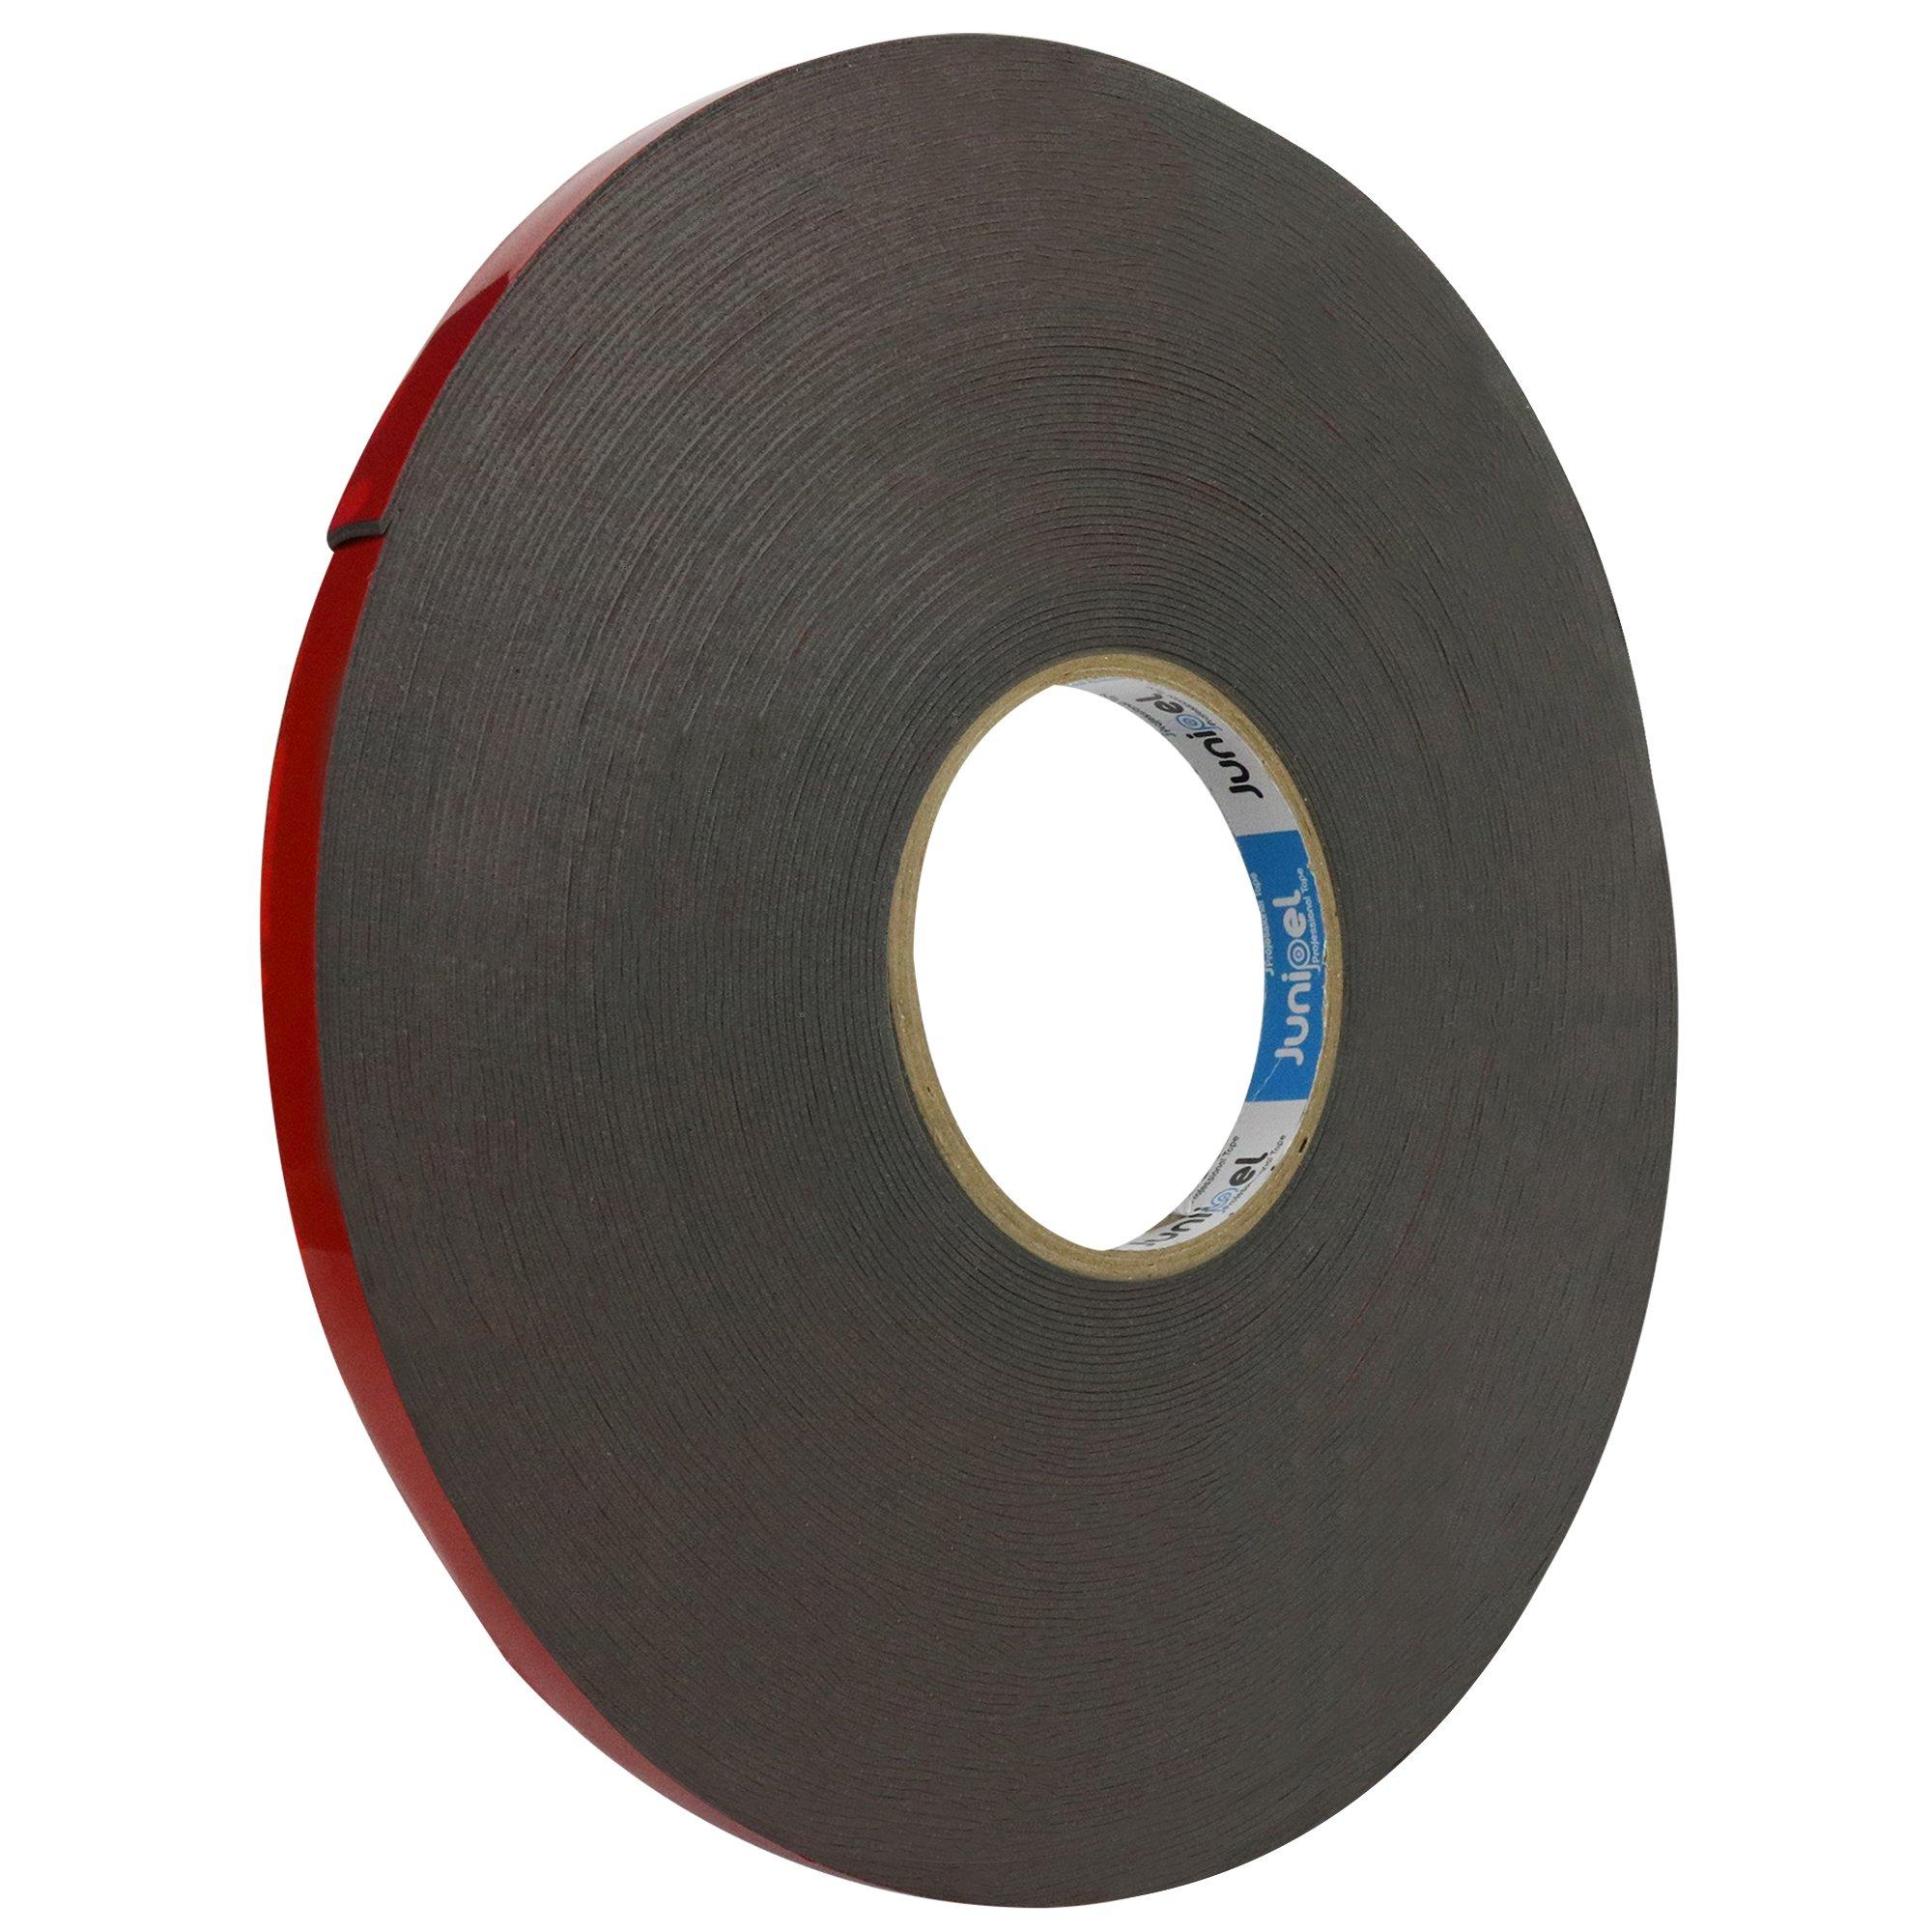 Junipel Automotive Grade Black Heavy Duty High Bound High Density Double Sided Tape 108 ft. Master Roll (1/2 in.)